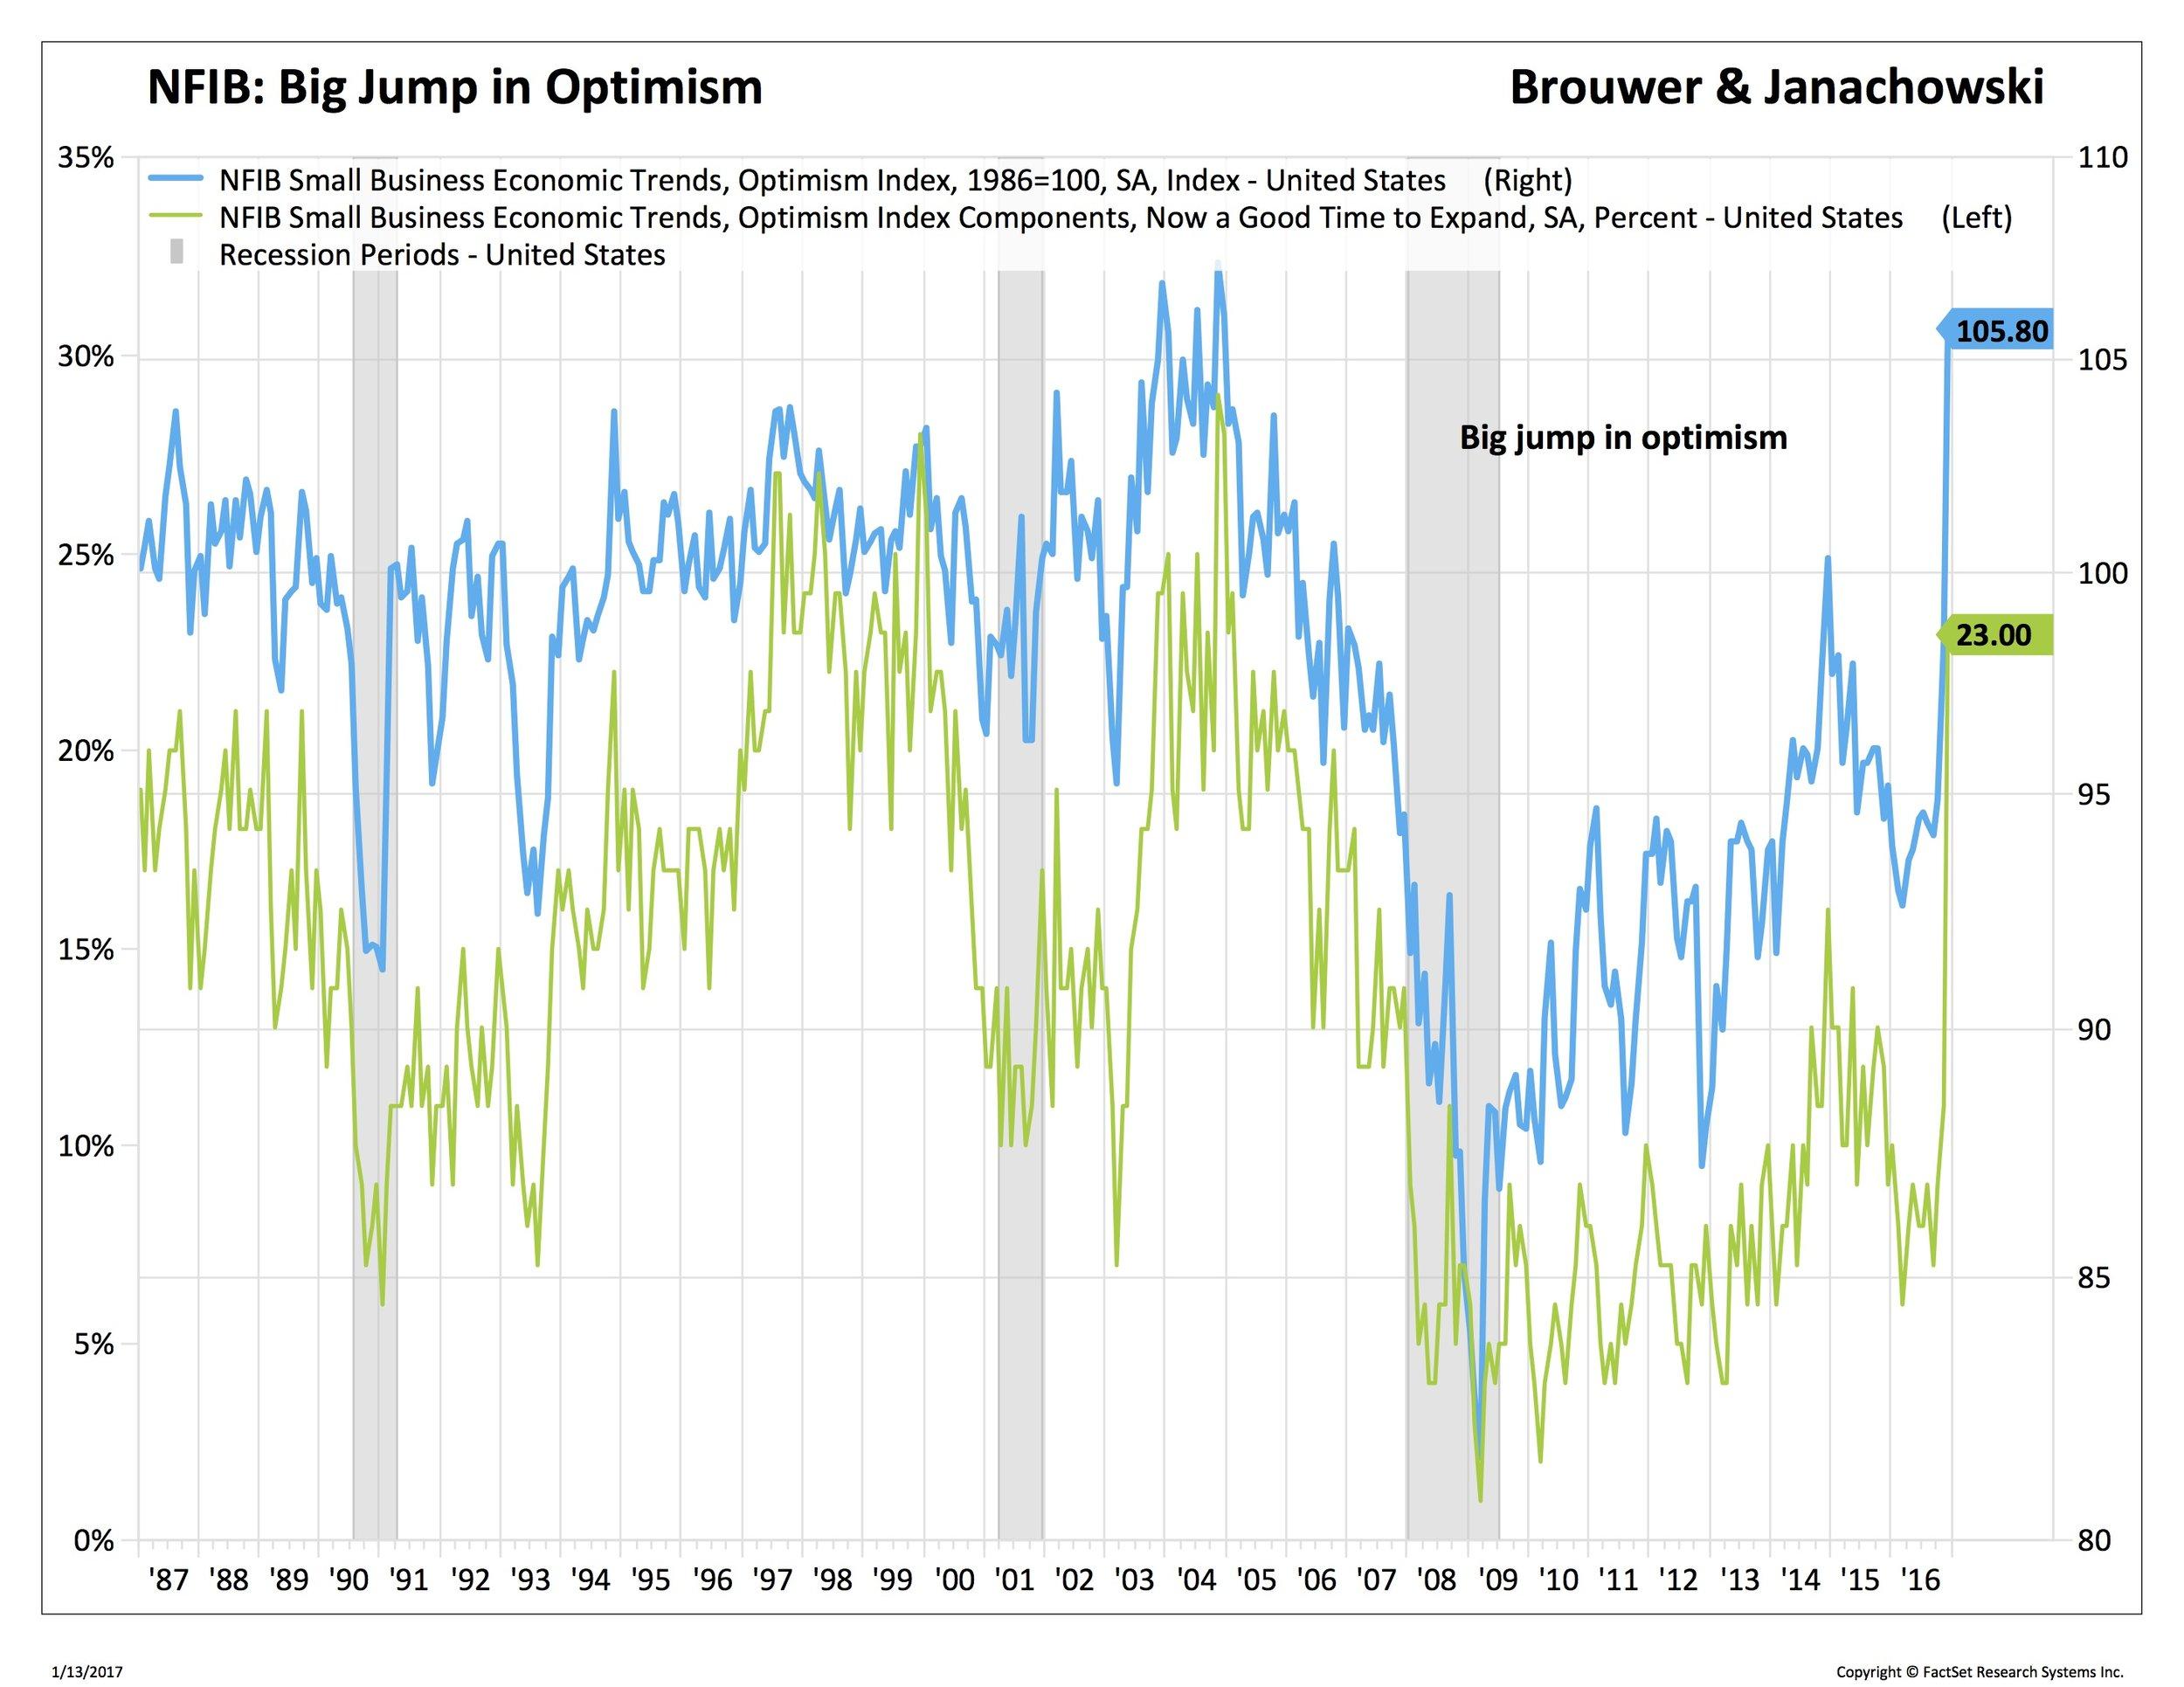 Blog 2 01-16-2017 Optimism 1_DJII-USA.jpg